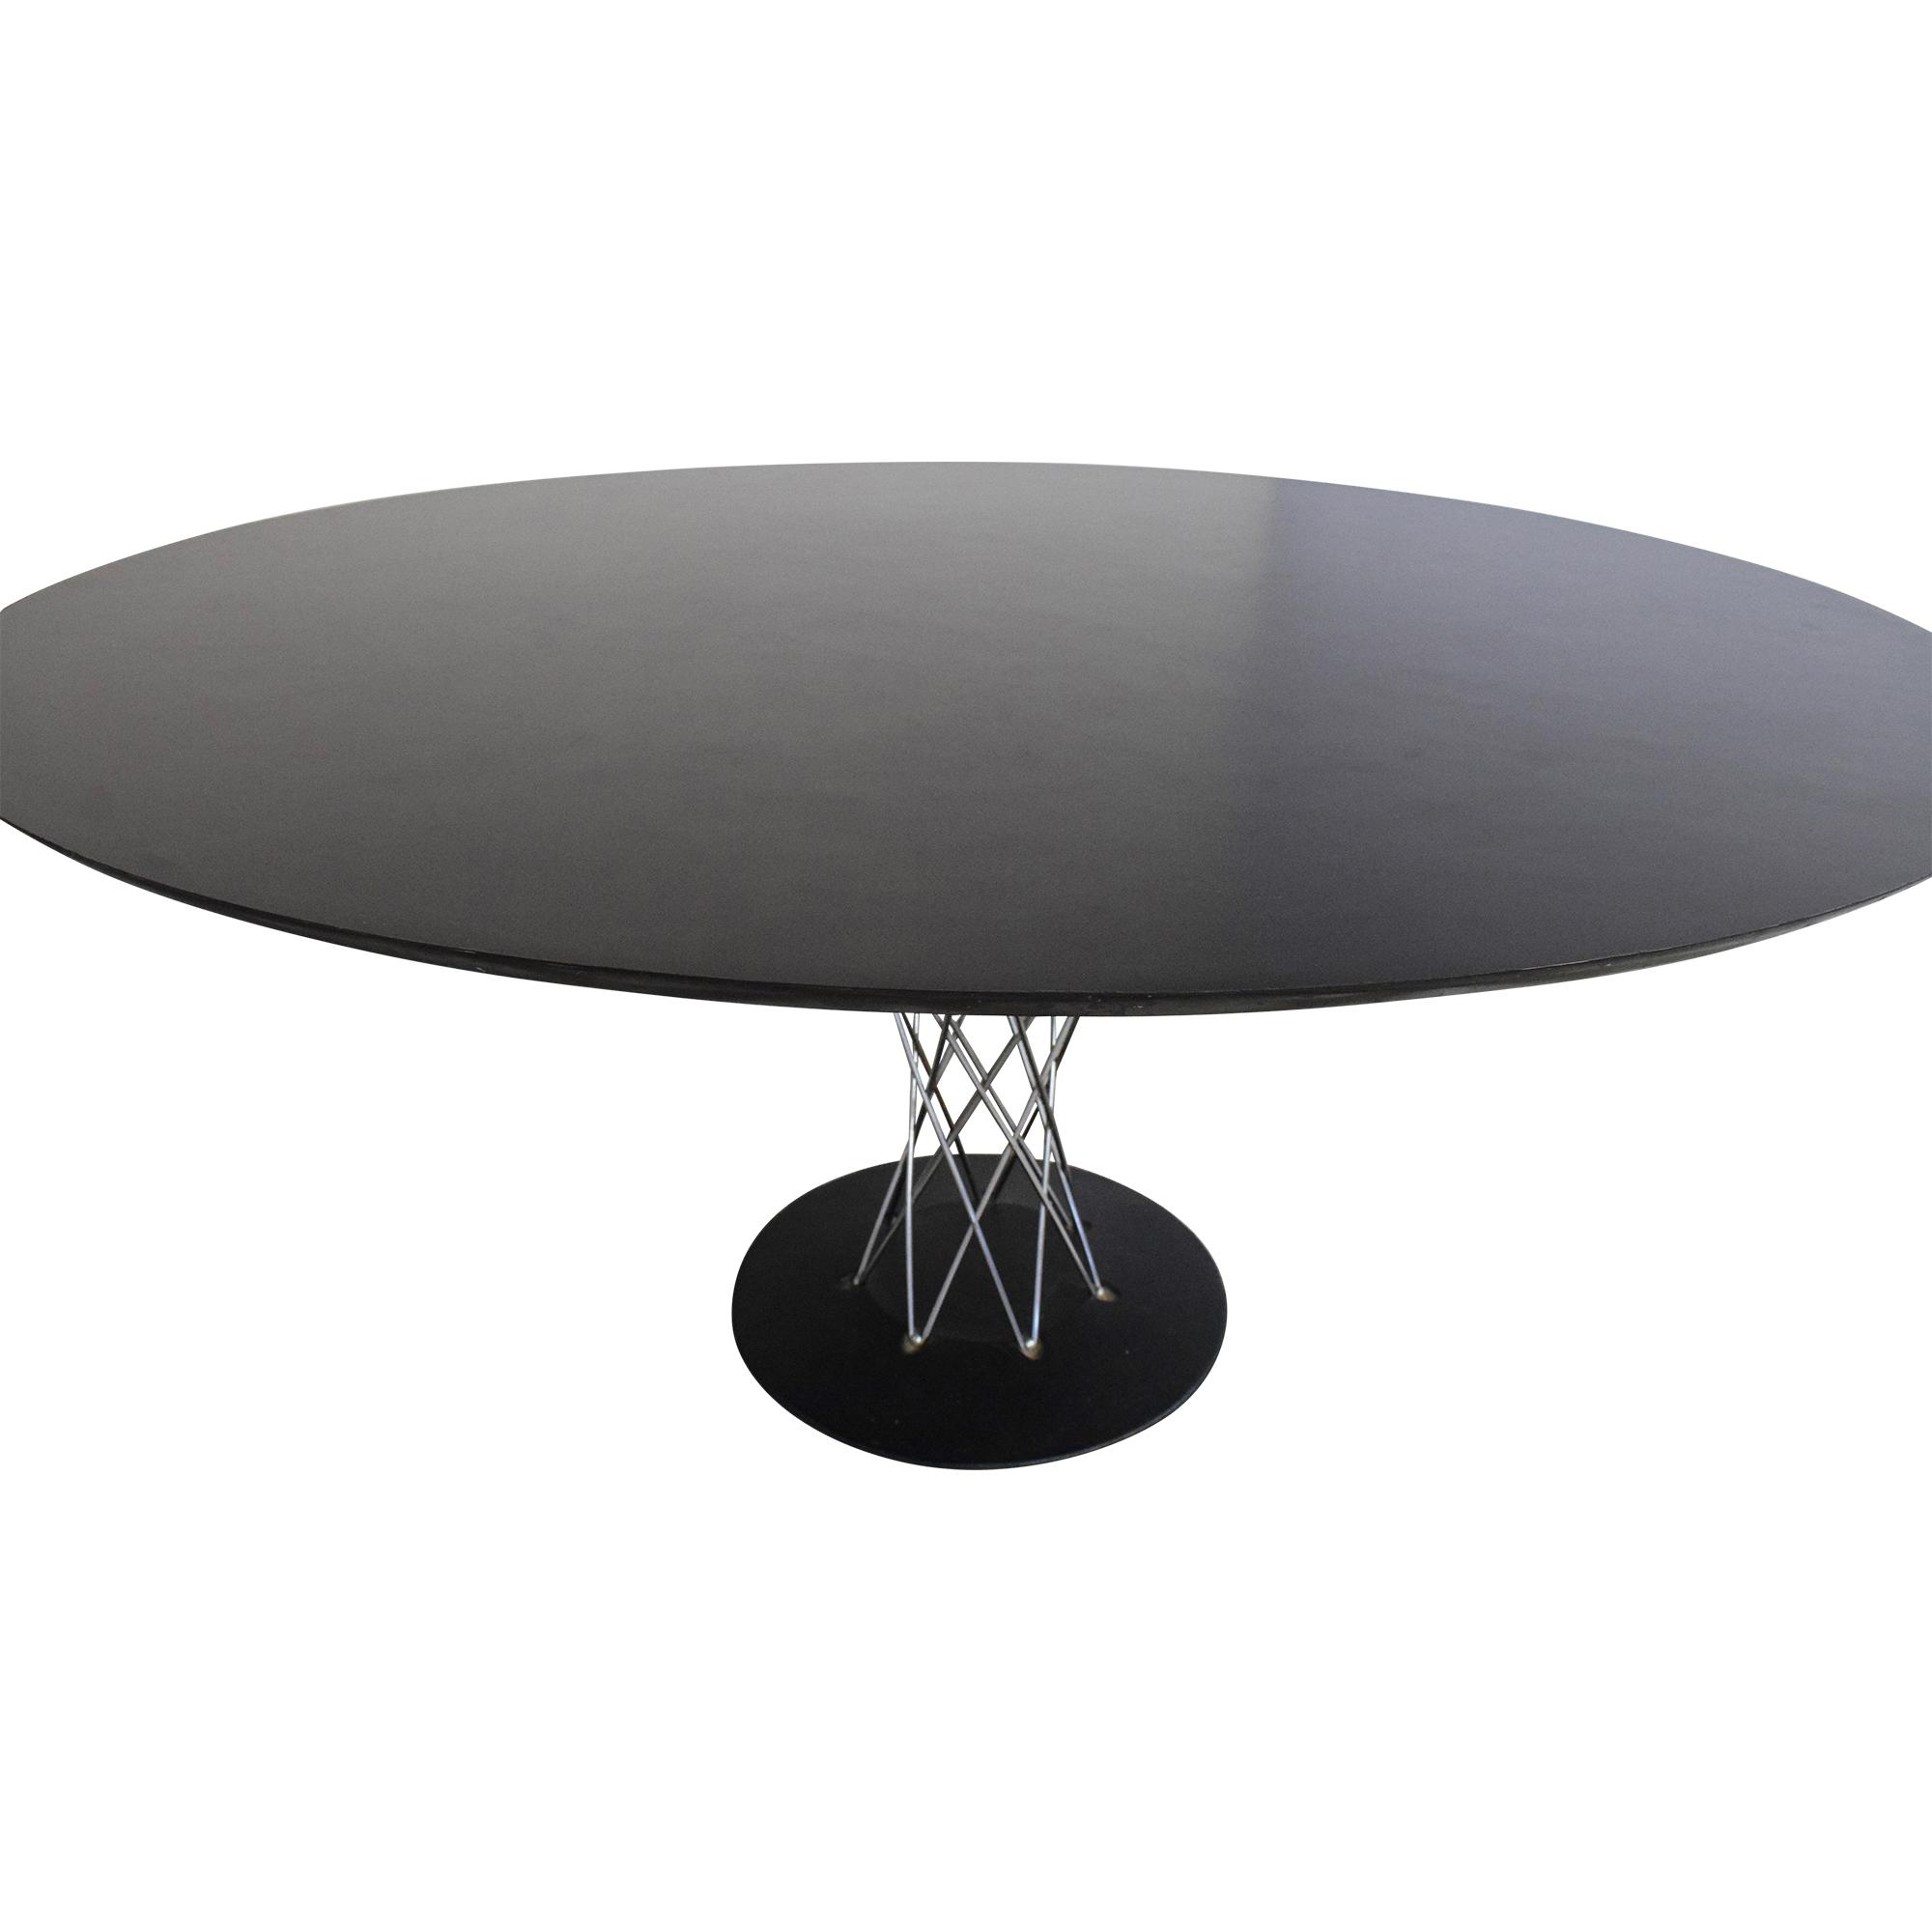 Modernica Modernica Cyclone Dining Table by Isamu Noguchi pa